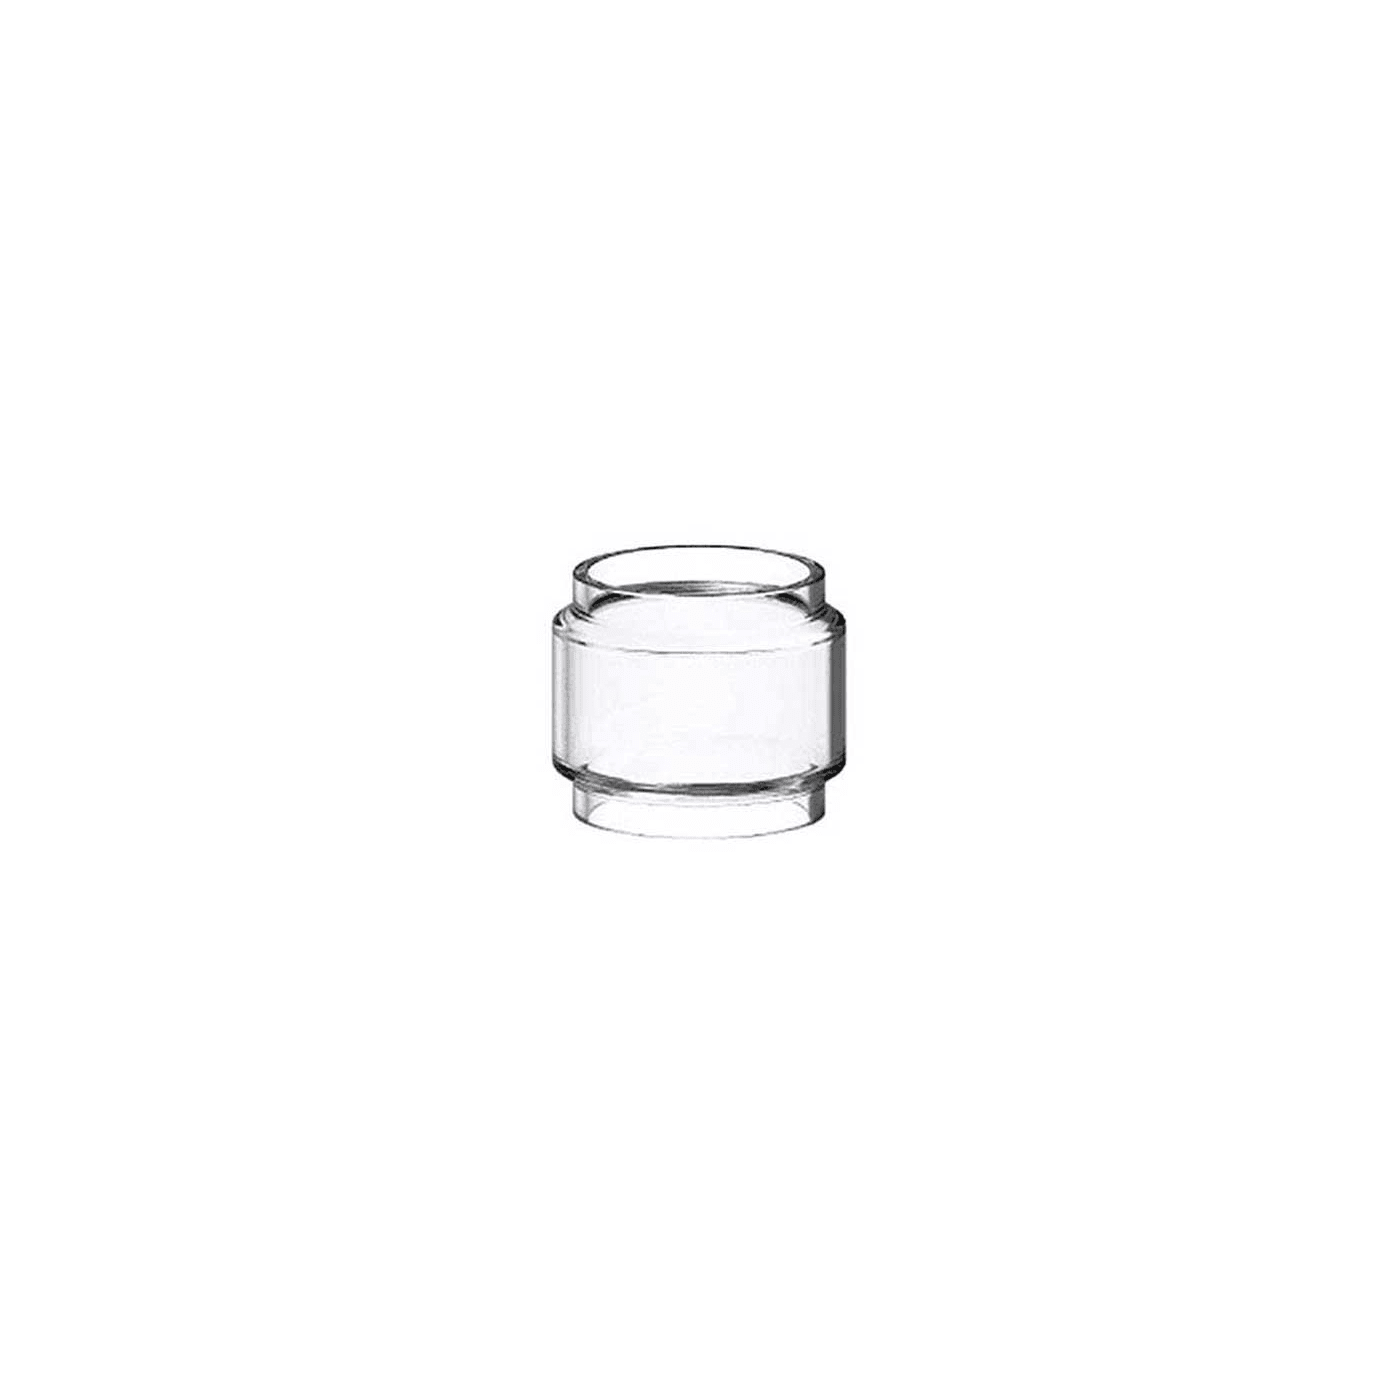 Smok TFV12 Prince Replacement Glass - 1 Pack